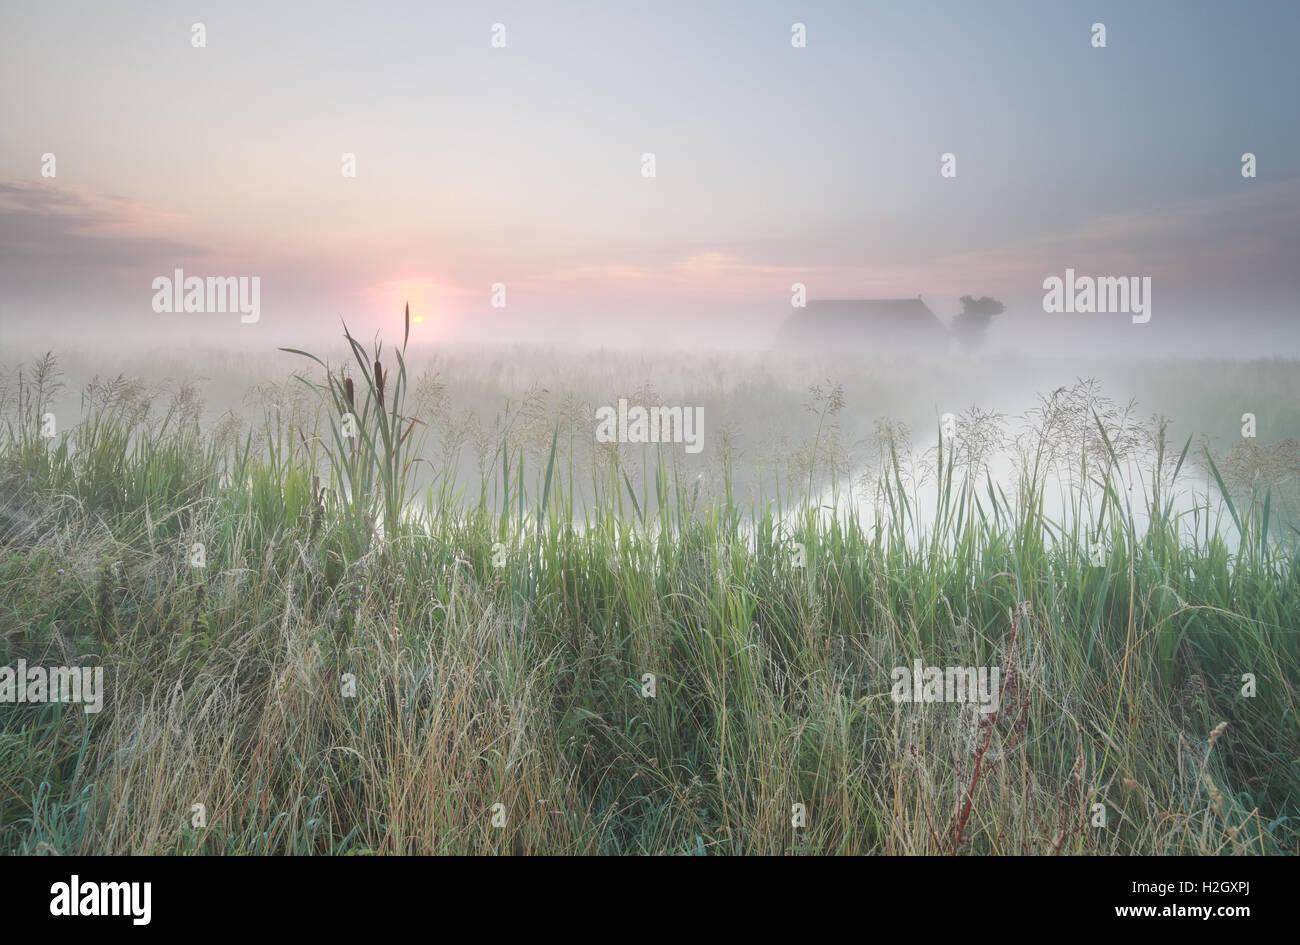 Dutch misty terreni agricoli a sunrise Immagini Stock